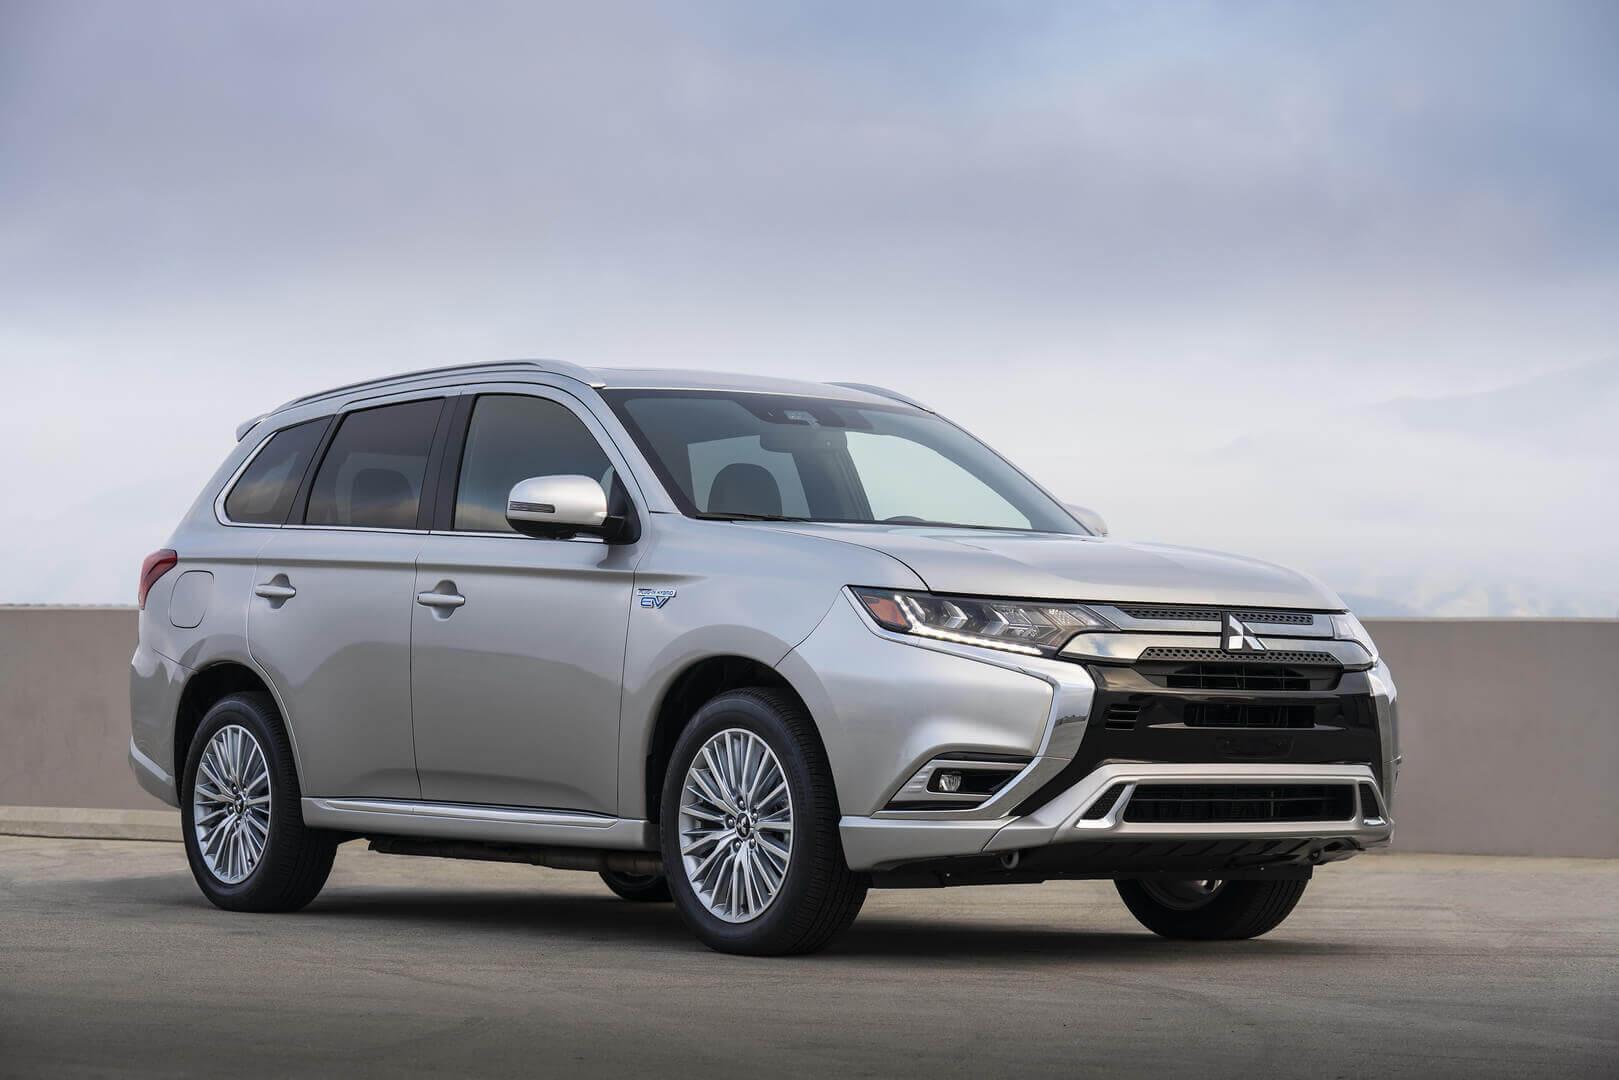 Плагин-гибрид Mitsubishi Outlander PHEV 2021 года